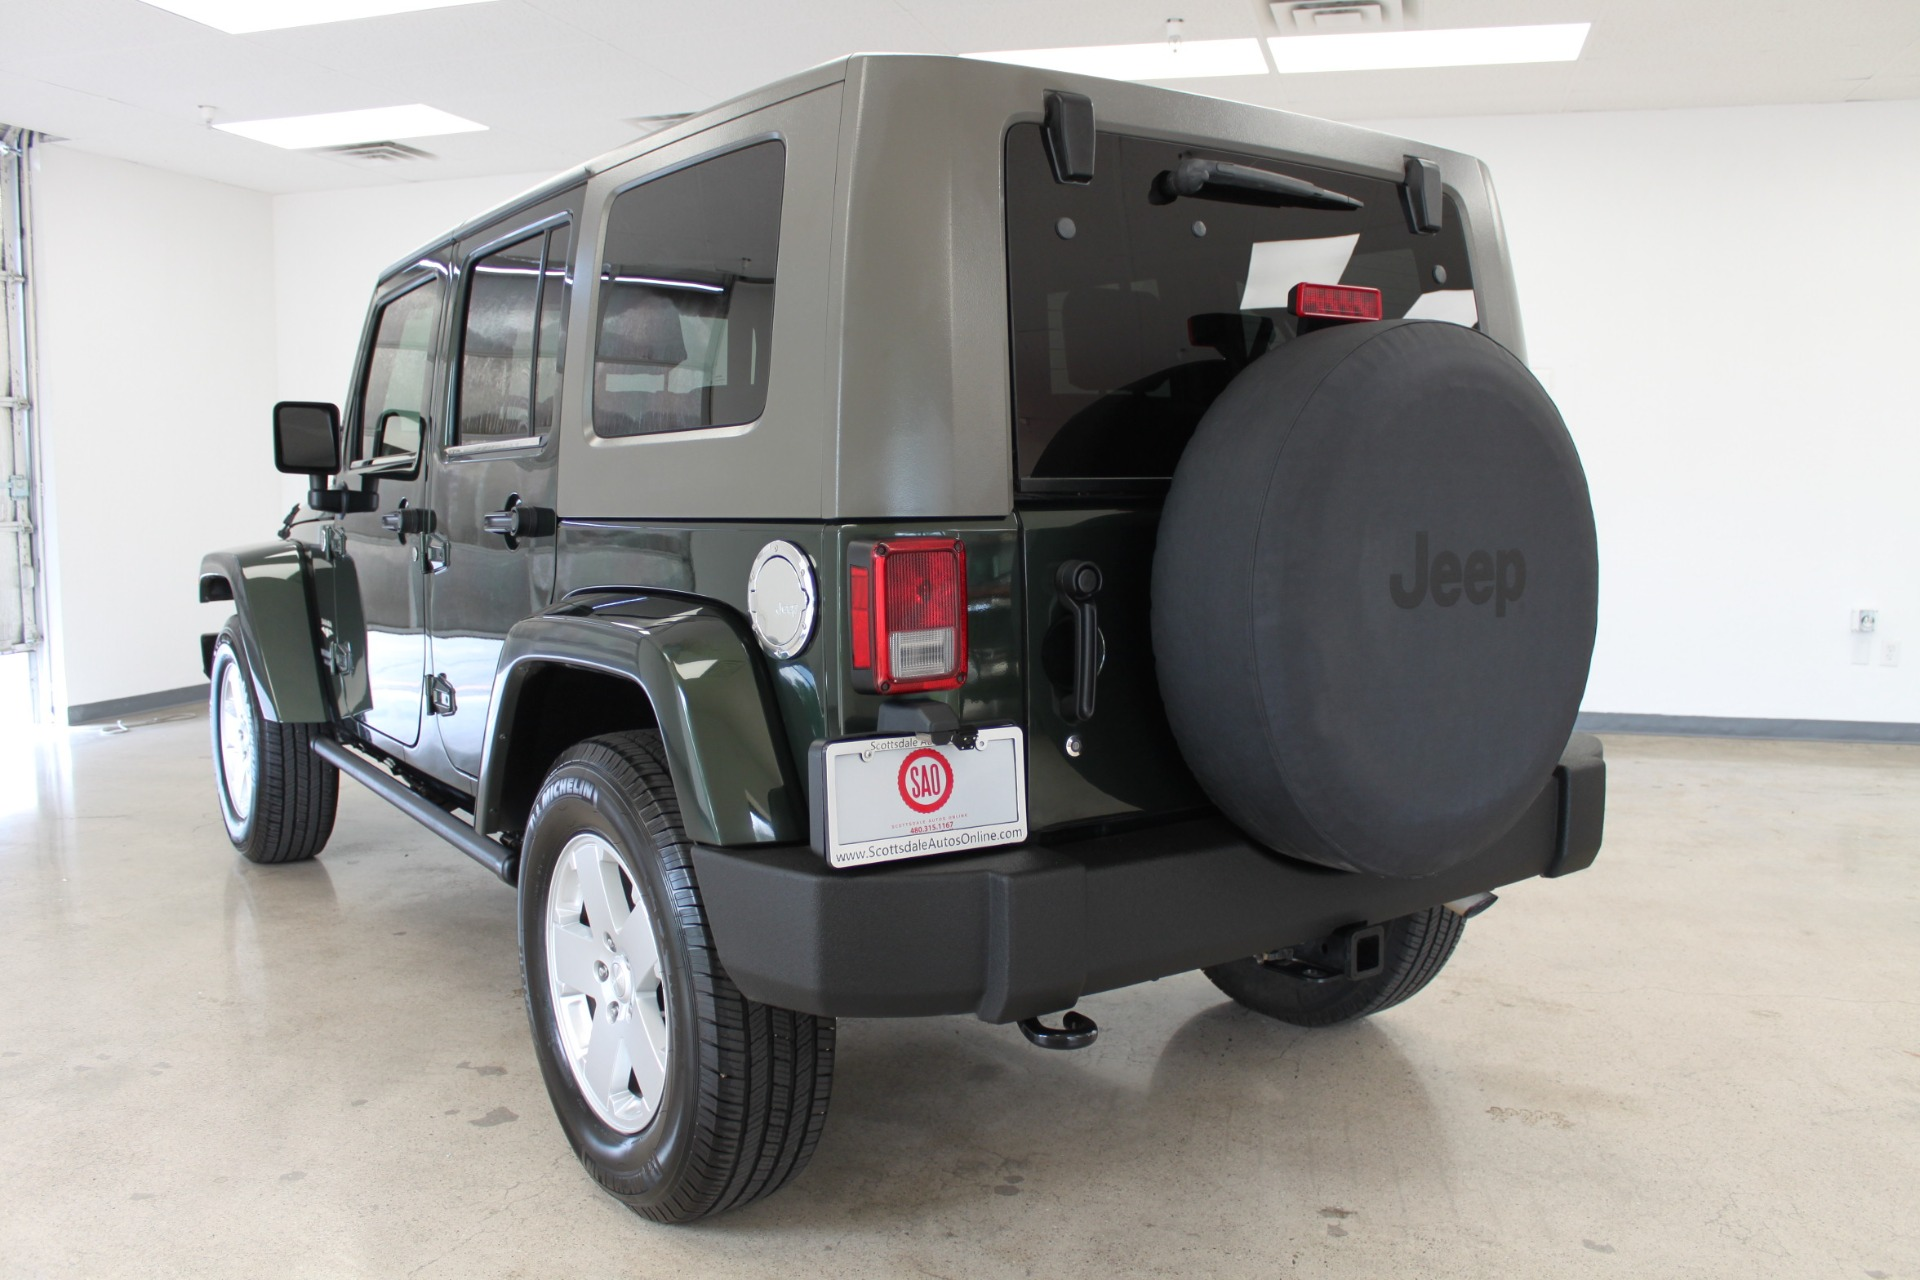 Used-2010-Jeep-Wrangler-Unlimited-Sahara-4X4-Mopar